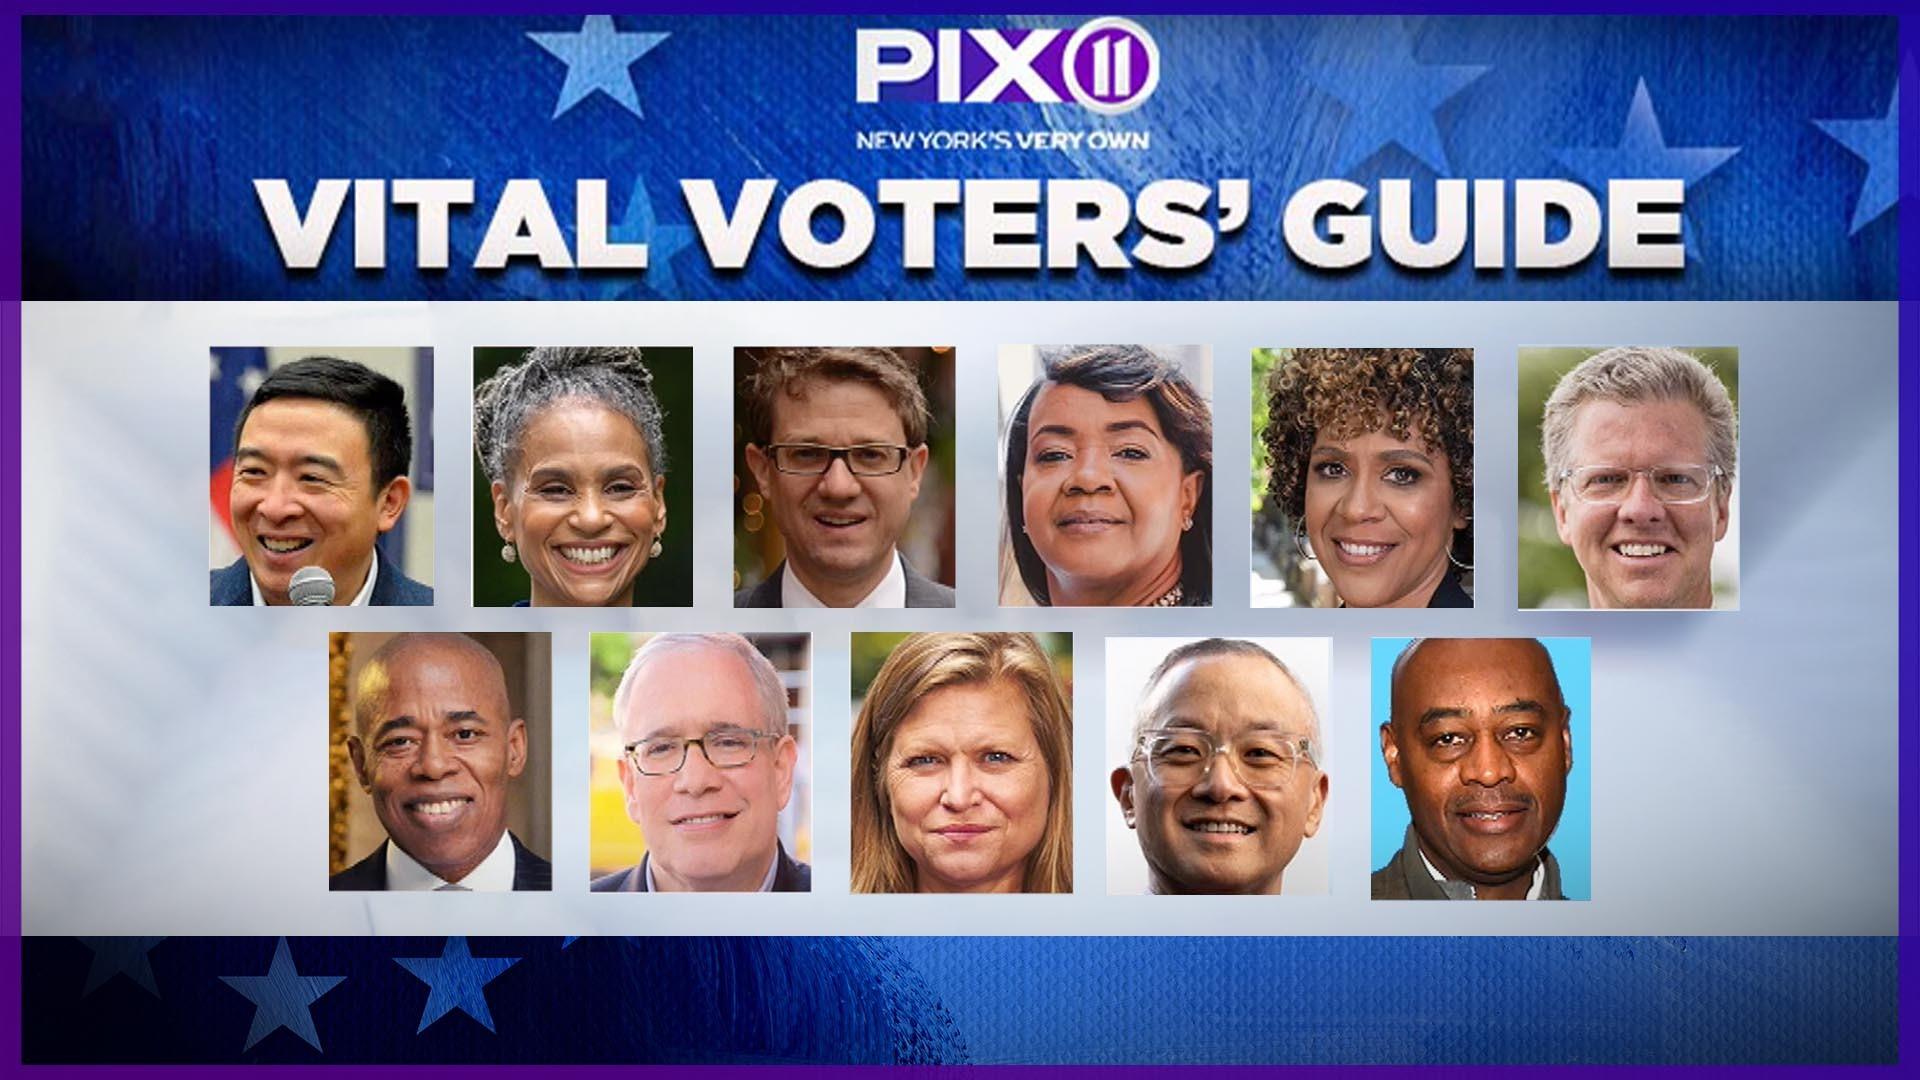 PIX11 Vital Voters' Guide